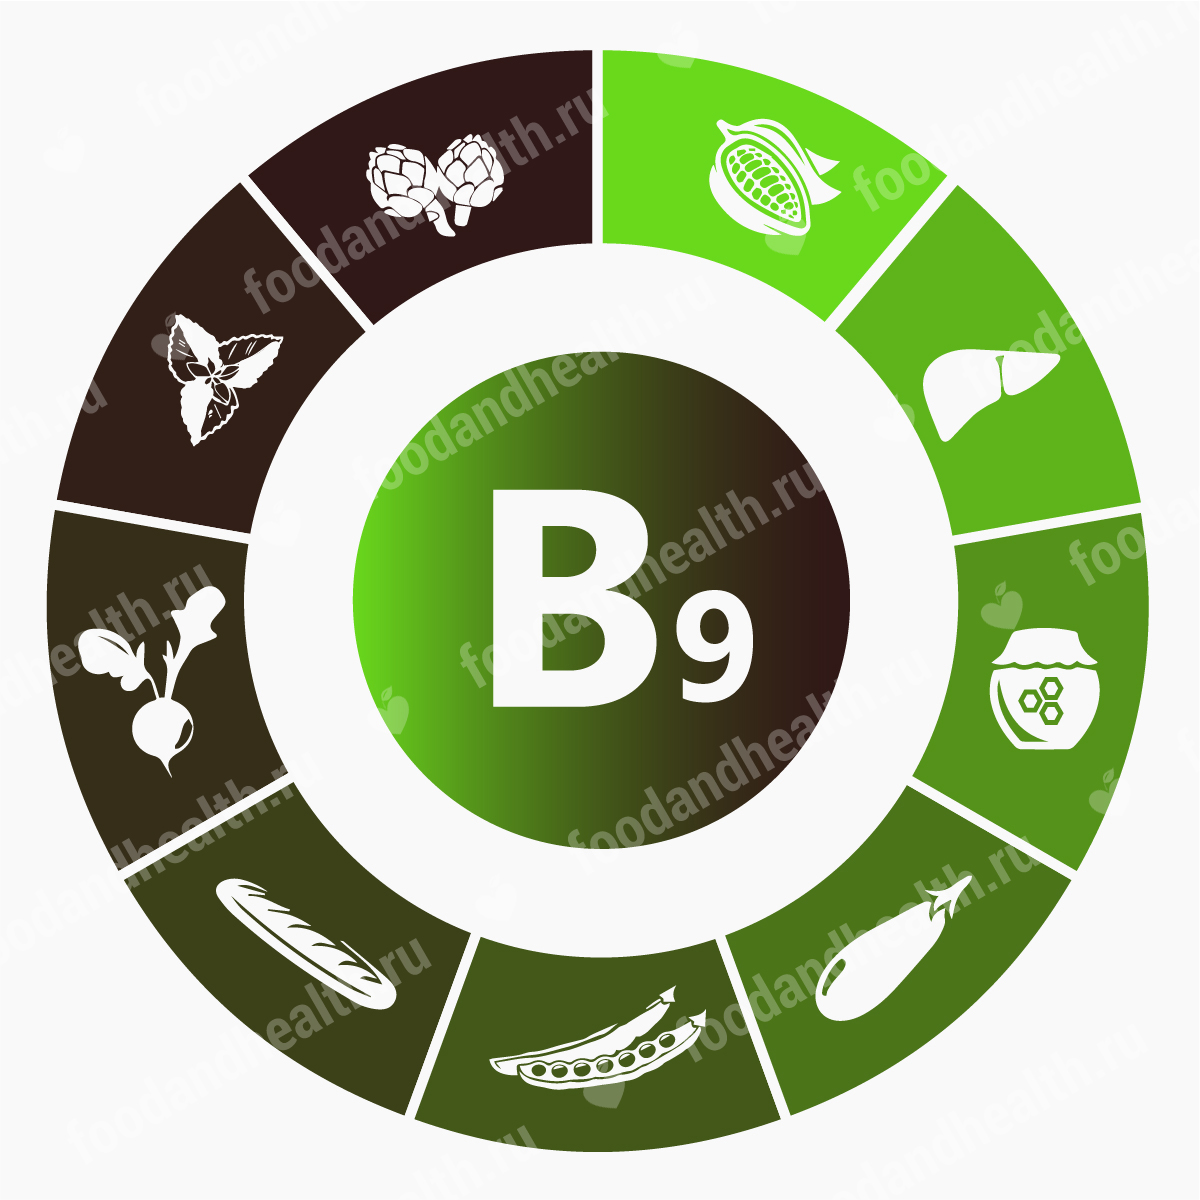 Вс о фолиевой кислоте характеристика витамина b9